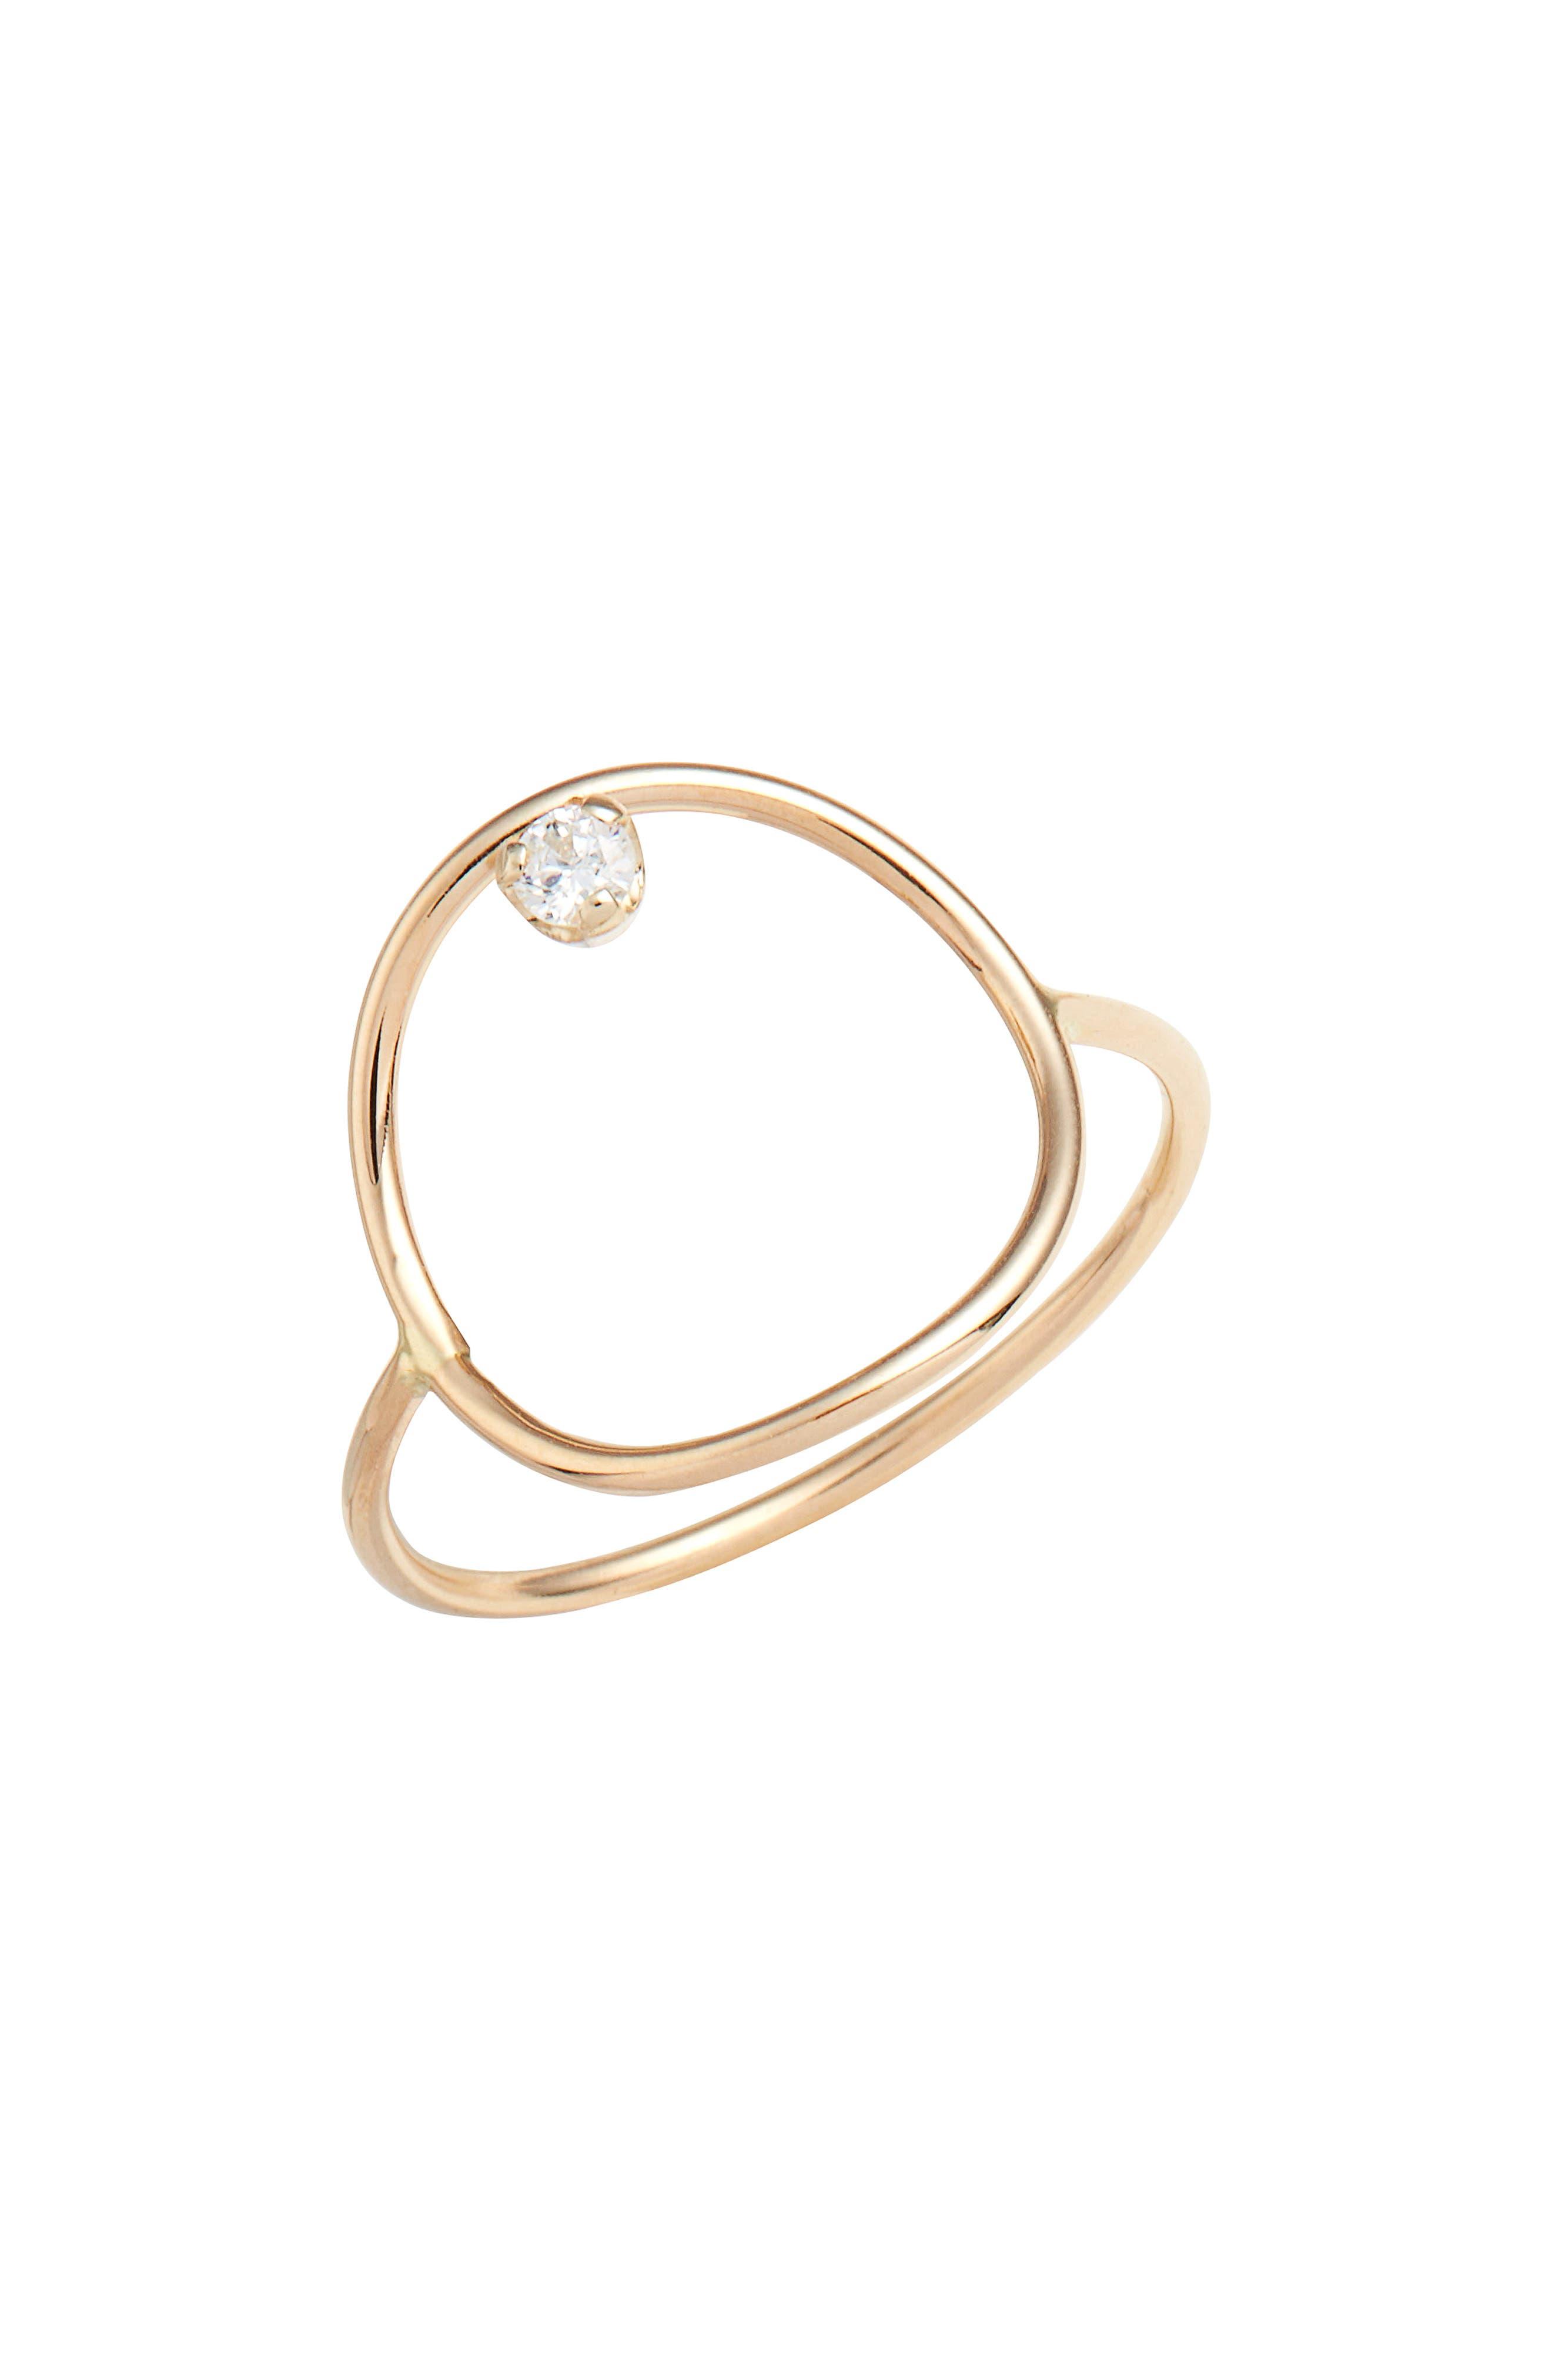 Diamond Circle Ring,                         Main,                         color, YELLOW GOLD/ OPAL